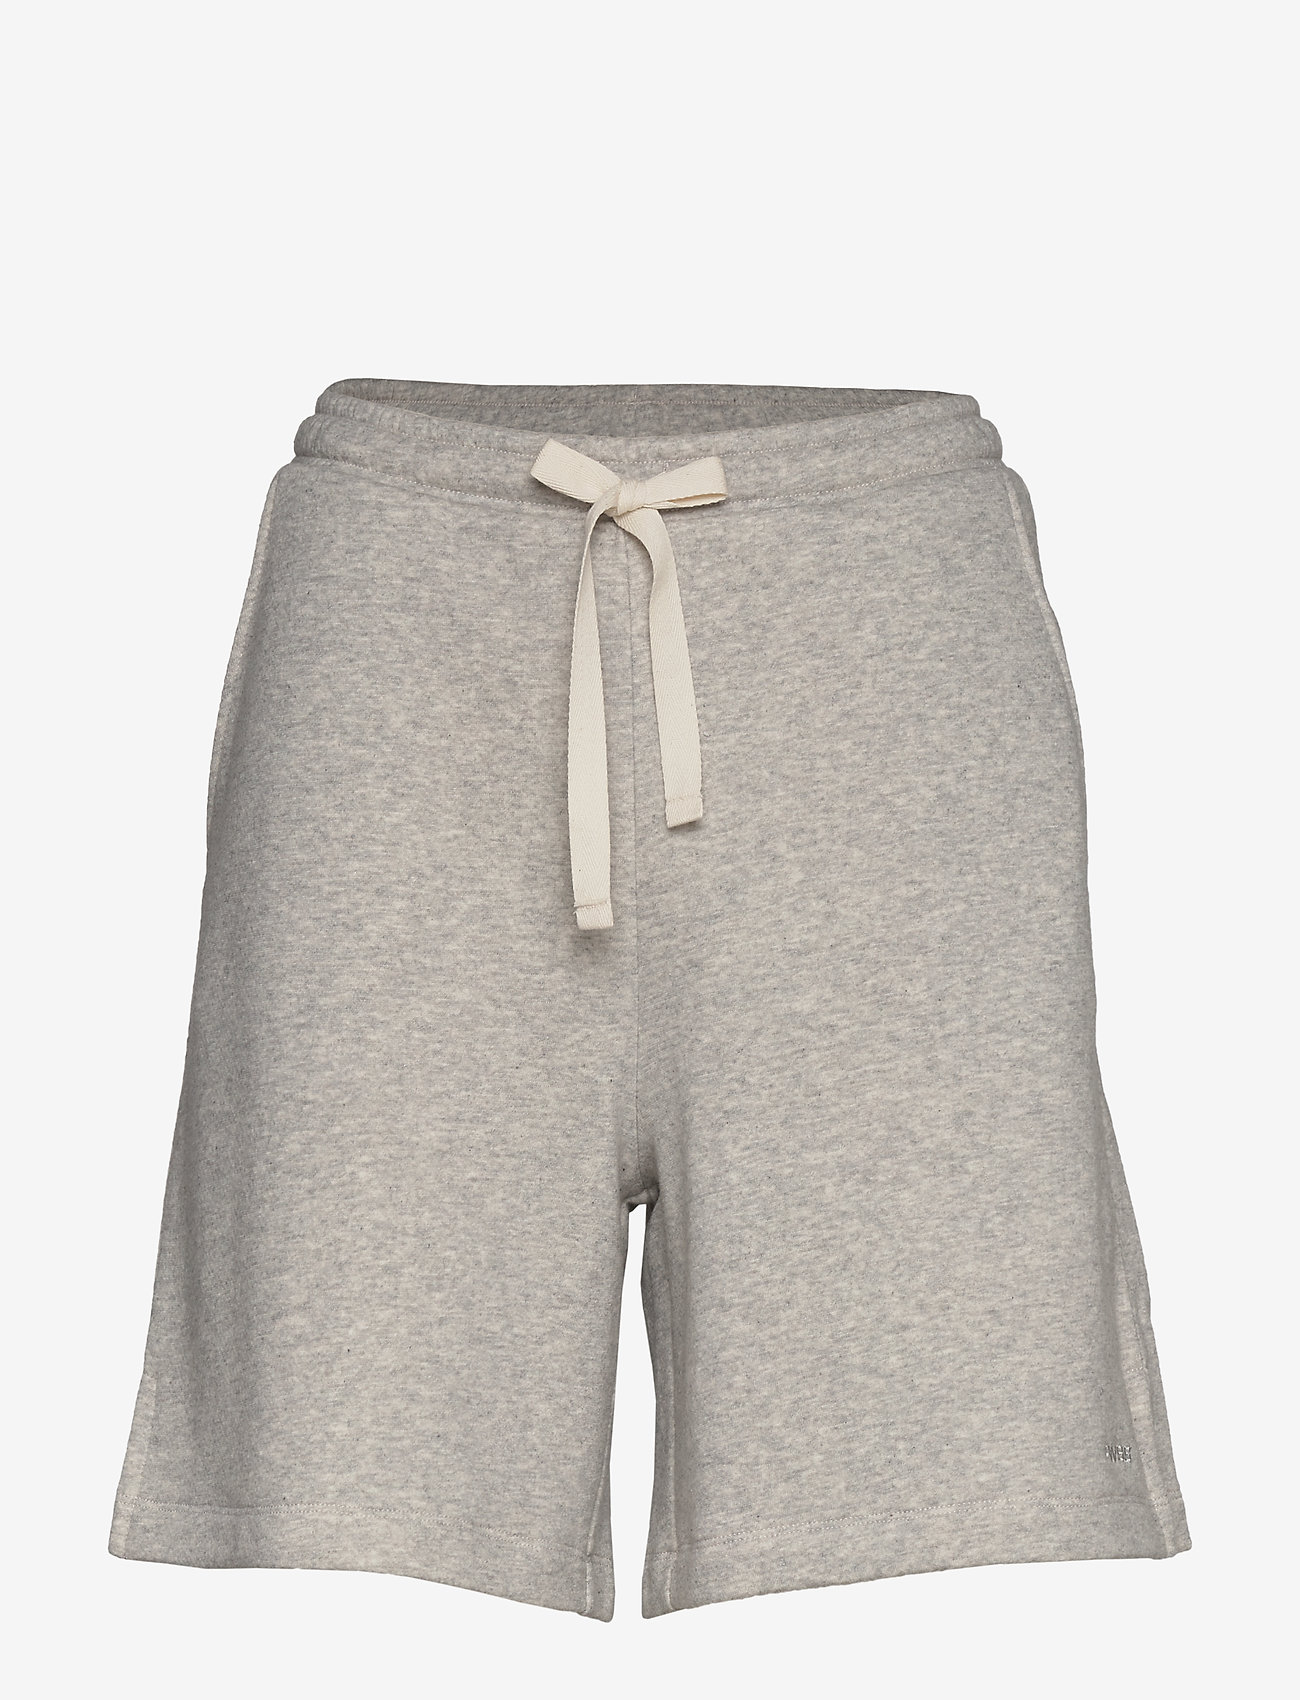 Fall Winter Spring Summer - Daniela Shorts - casual shorts - light gray - 0